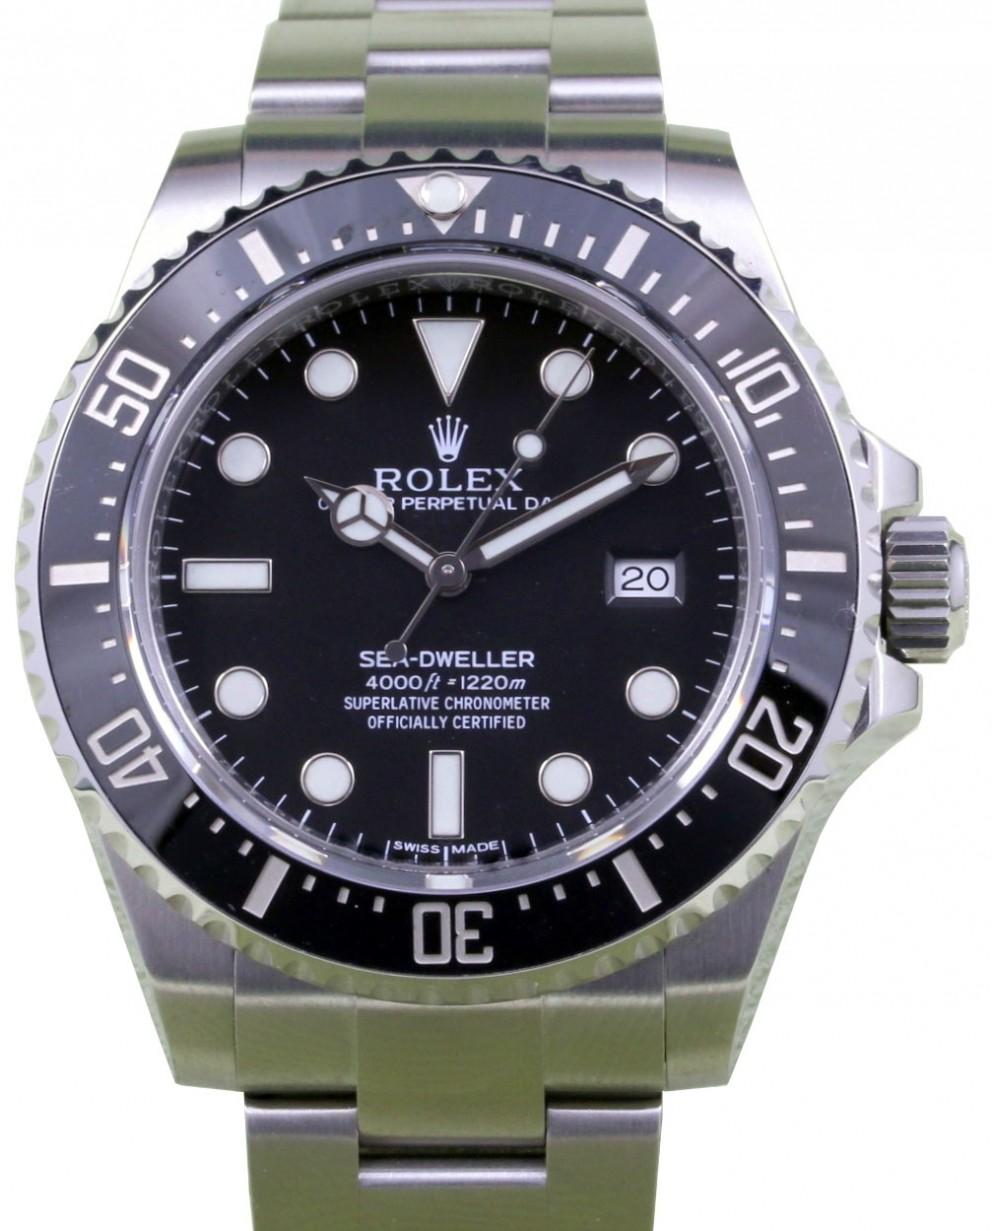 151c9ac46f3 Rolex Sea-Dweller 116600 Men's 40mm Diver Black Stainless Steel Oyster Date